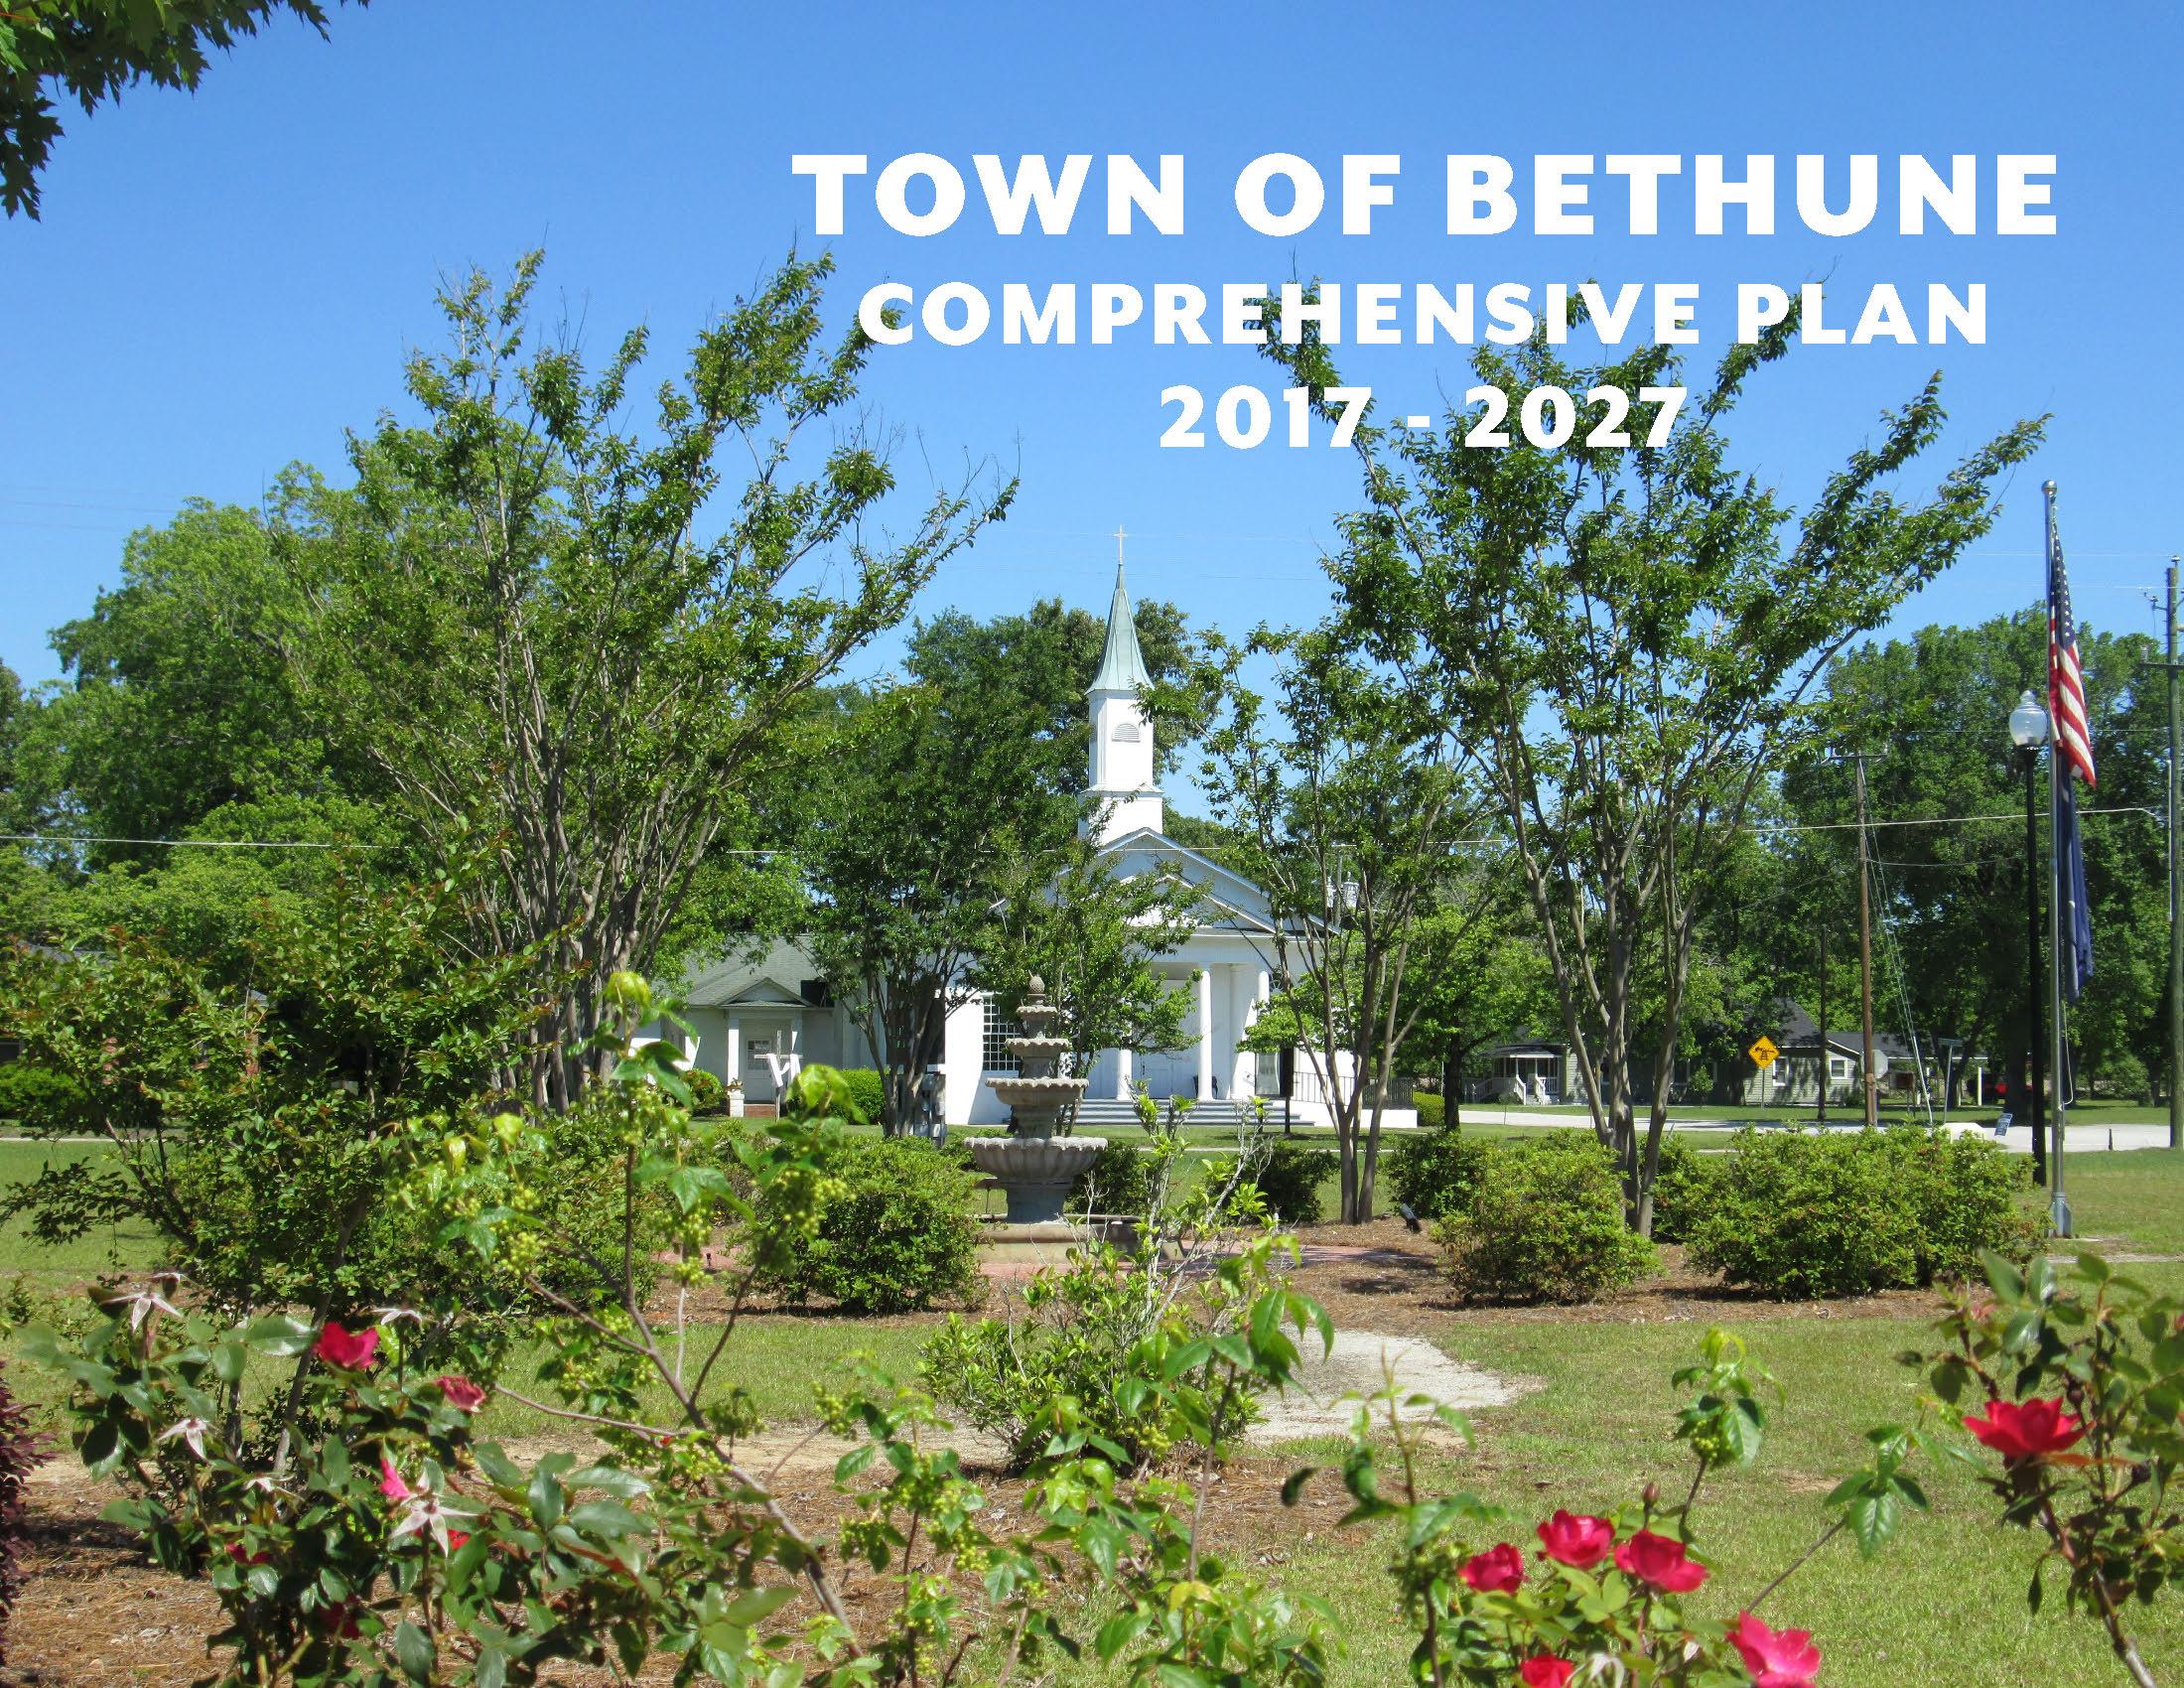 Bethune Comprehensive Plan Cover.jpg